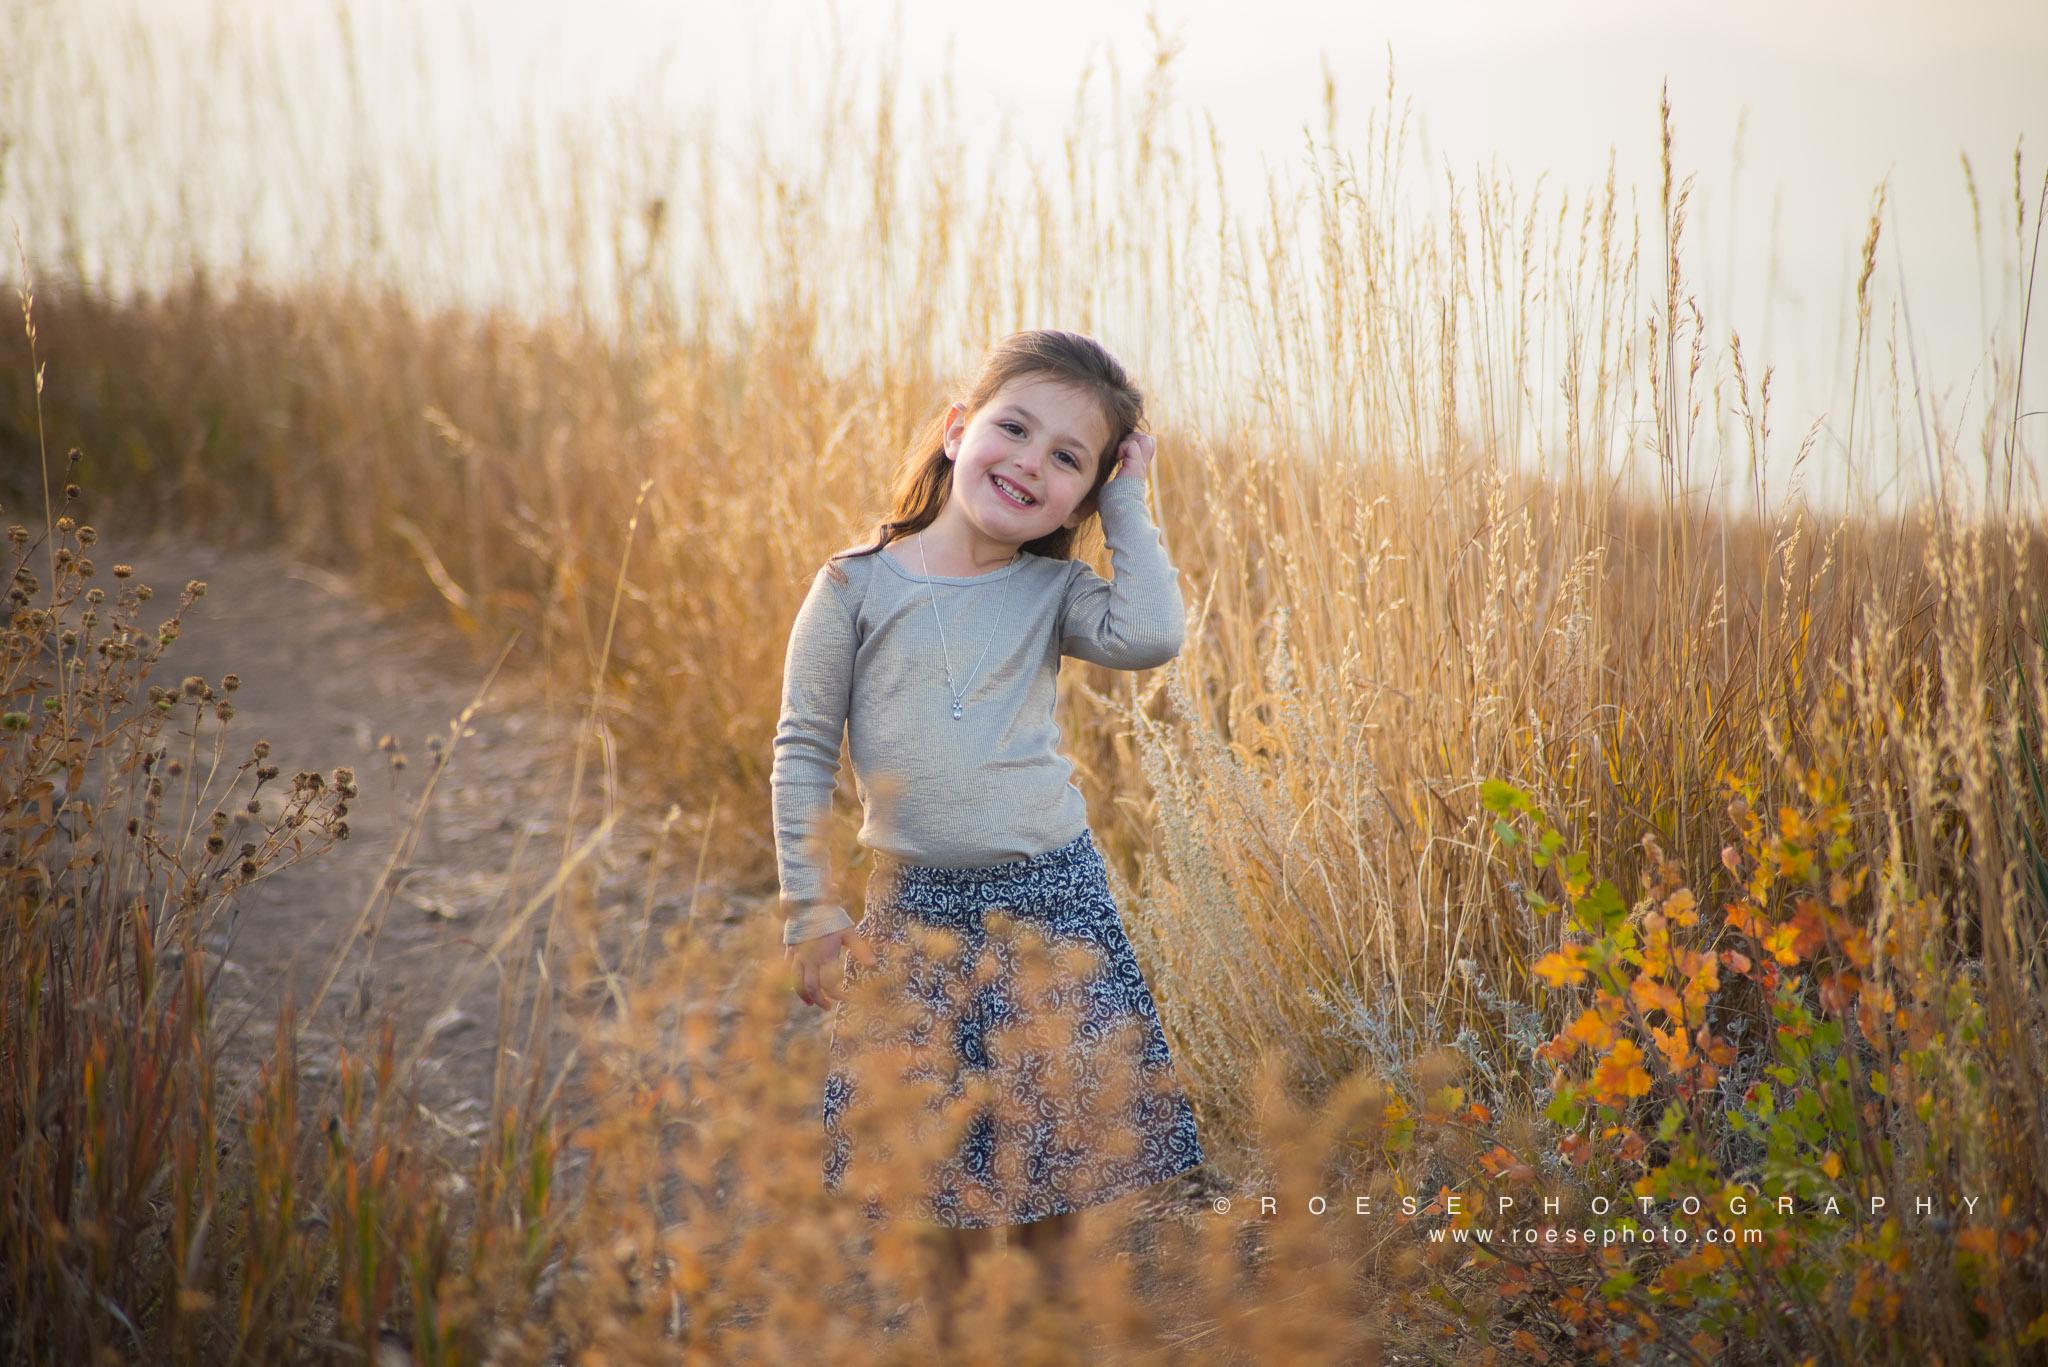 C.-Roese-Ramp-Roese-Photography-LLC.-Bennett-Family-2.jpg